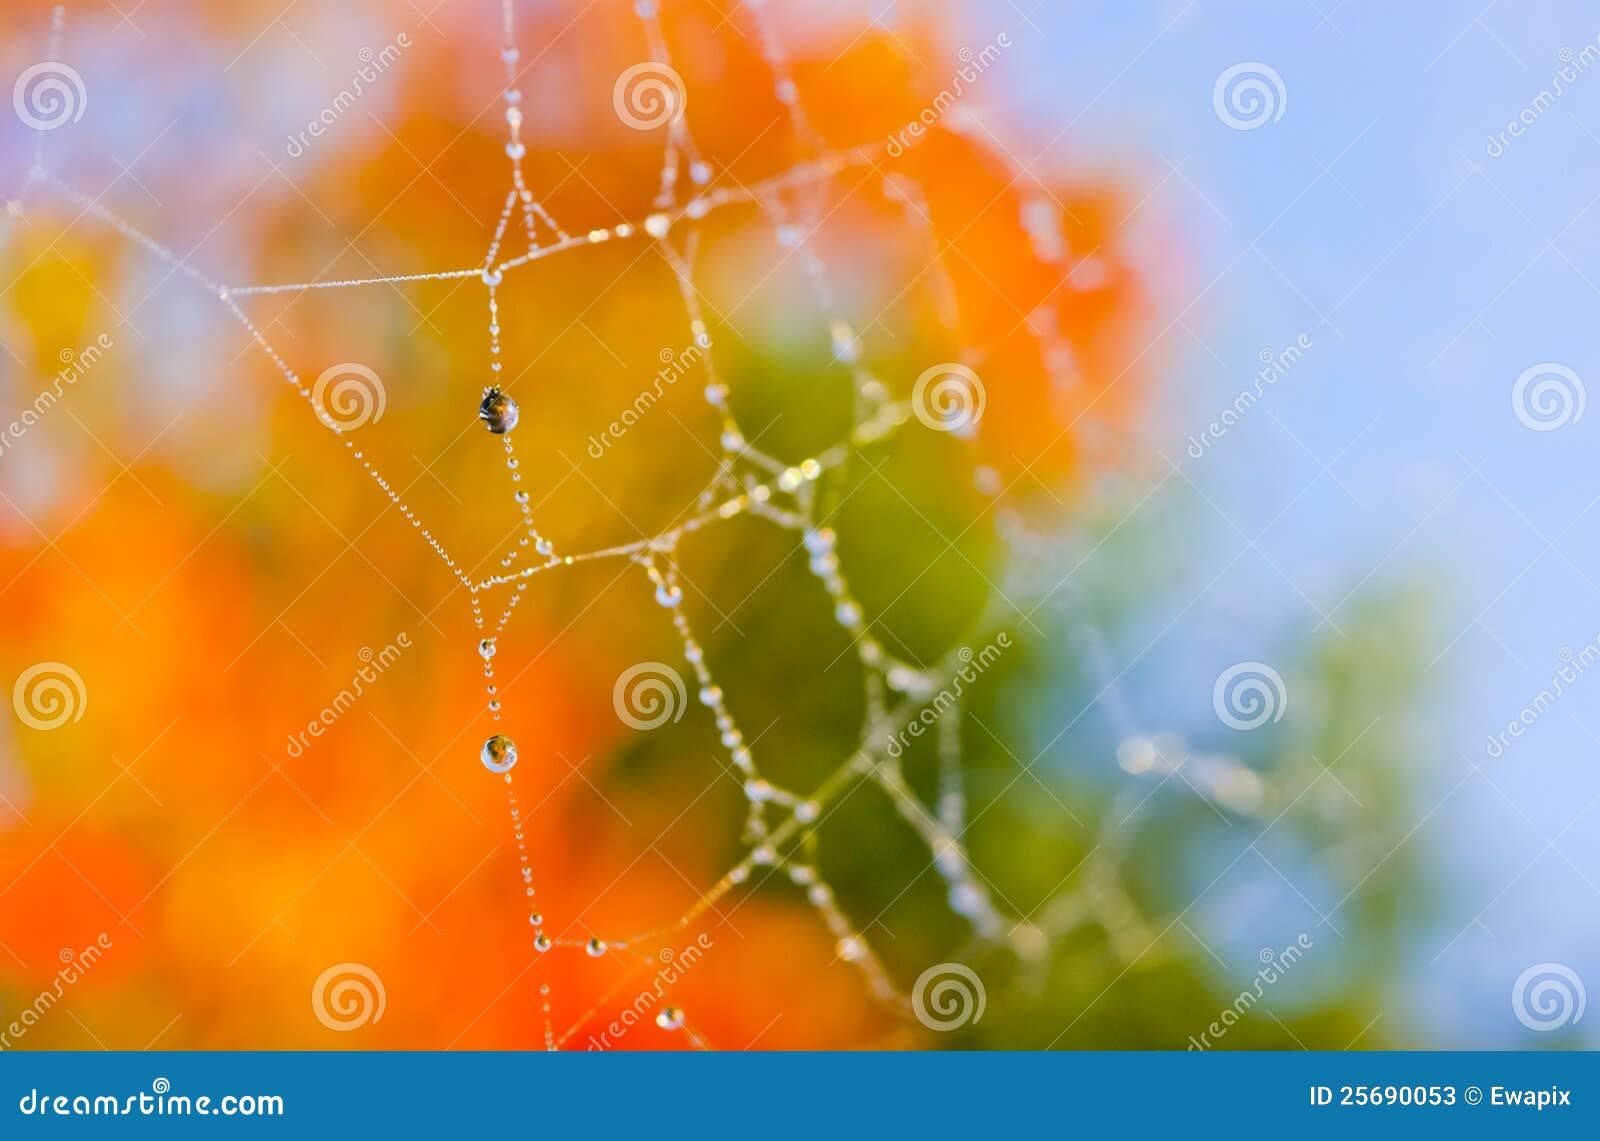 Autumn Fall Orange Spider Web Background Stock Image Image Of Vibrant Colorful 25690053